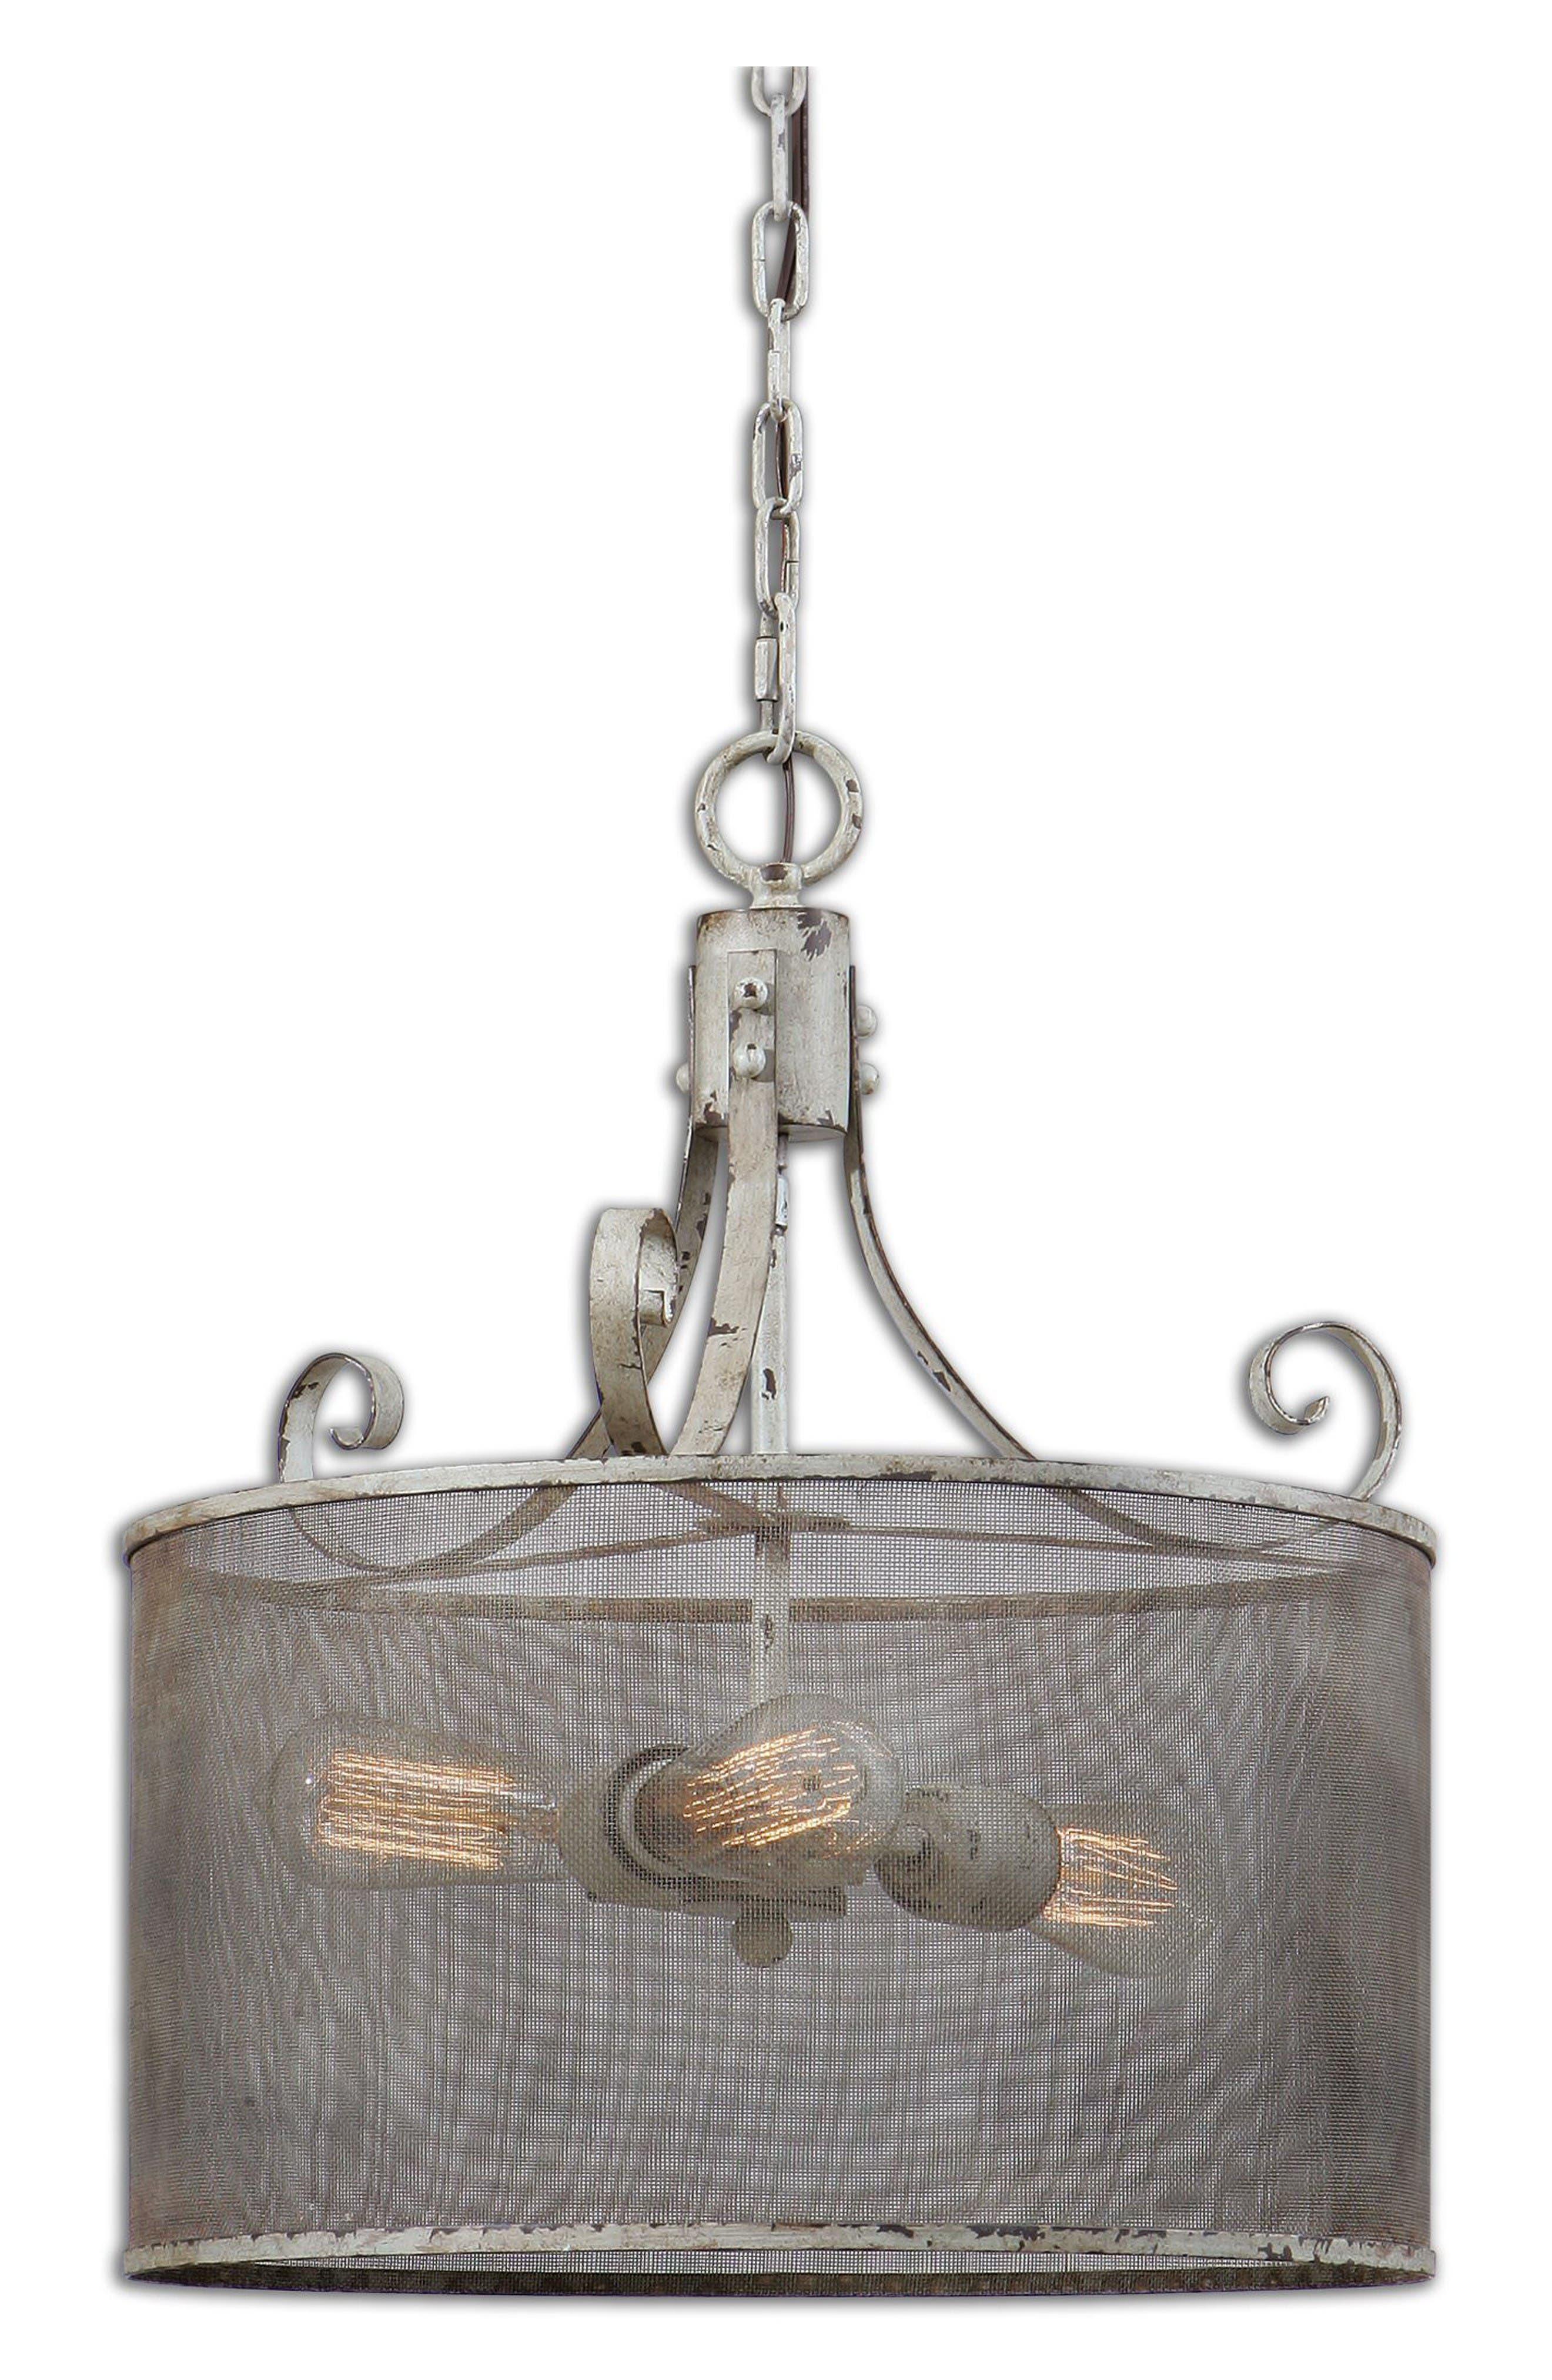 Main Image - Uttermost Pontoise Three Light Drum Pendant Lamp